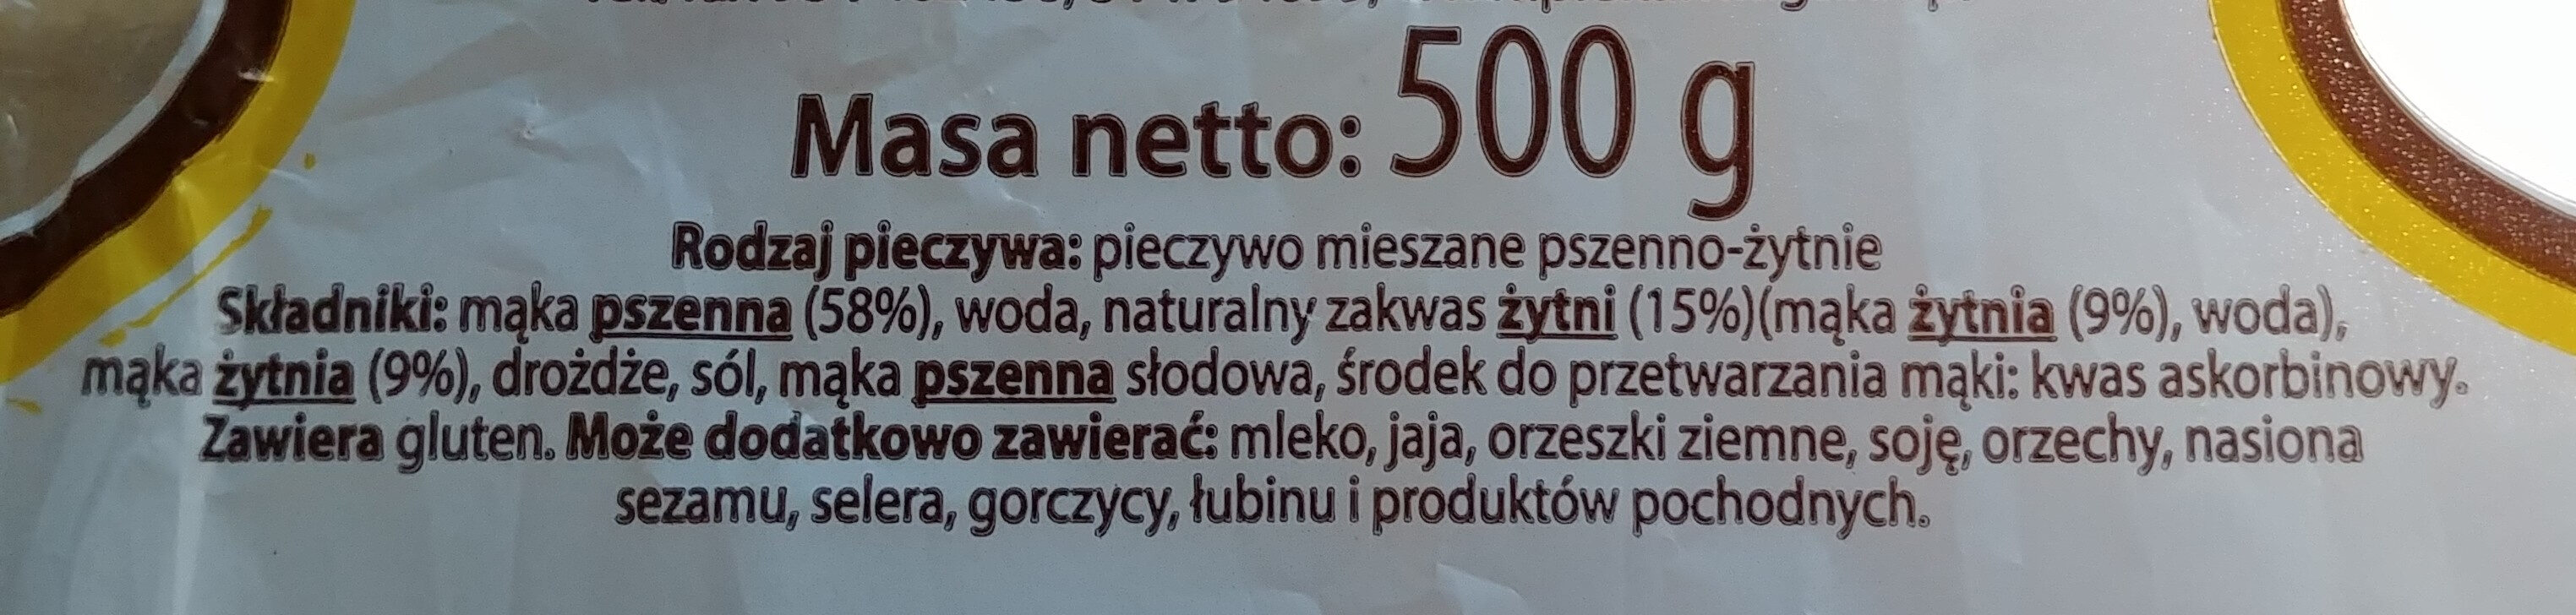 Chleb Baltonowski krojony - Ingredients